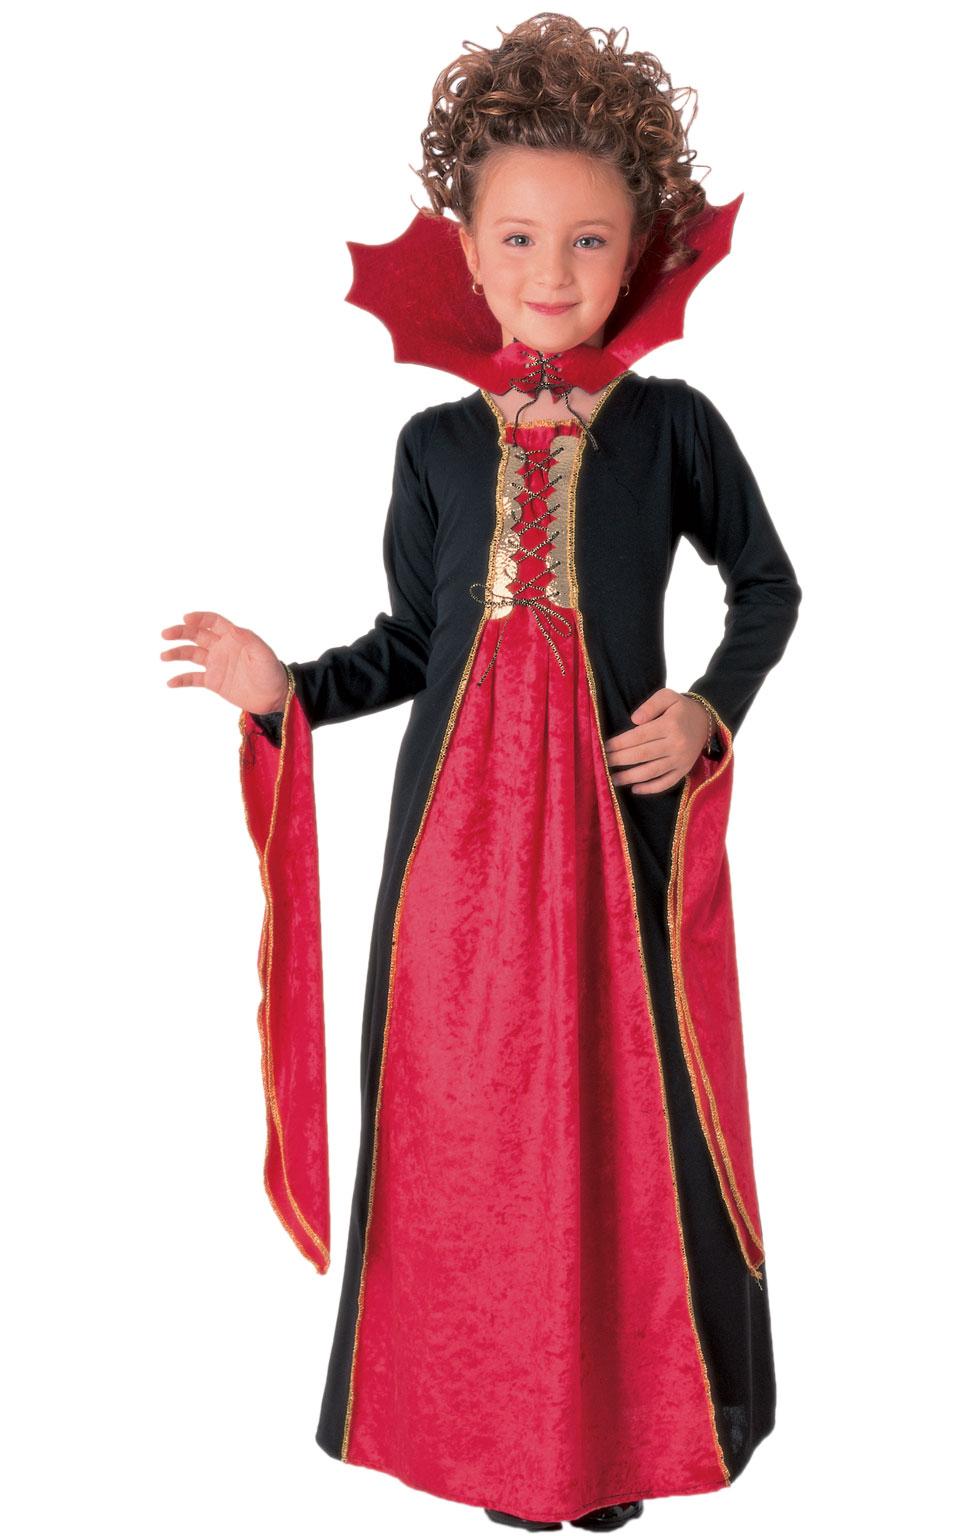 Childrens Gothic Vampiress Fancy Dress Costume Girls Halloween Childs Outfit M